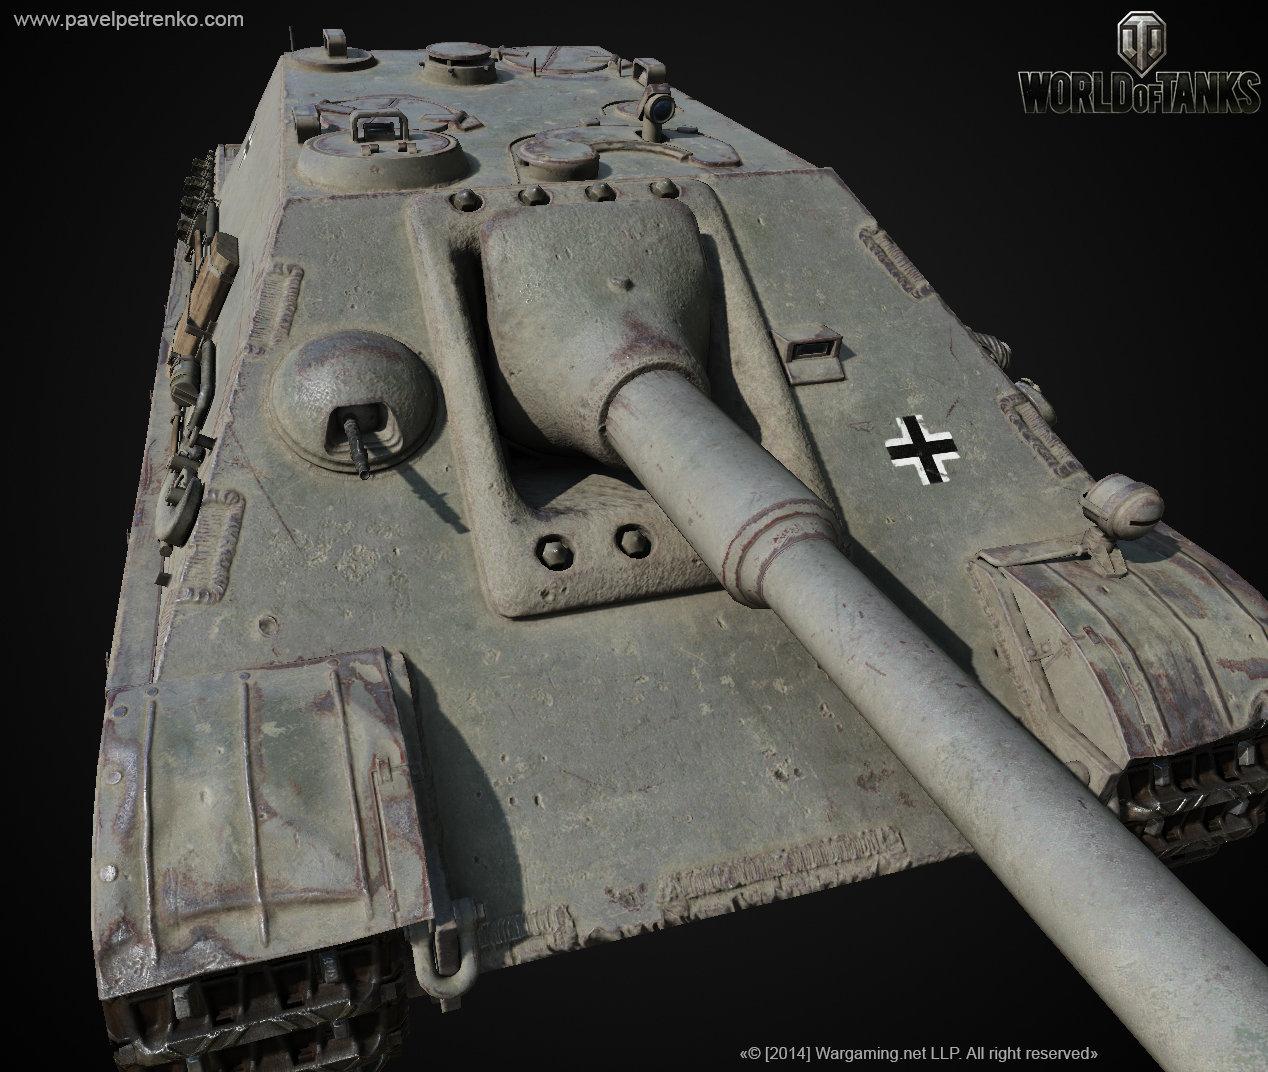 Pavel petrenko jagdpanther02